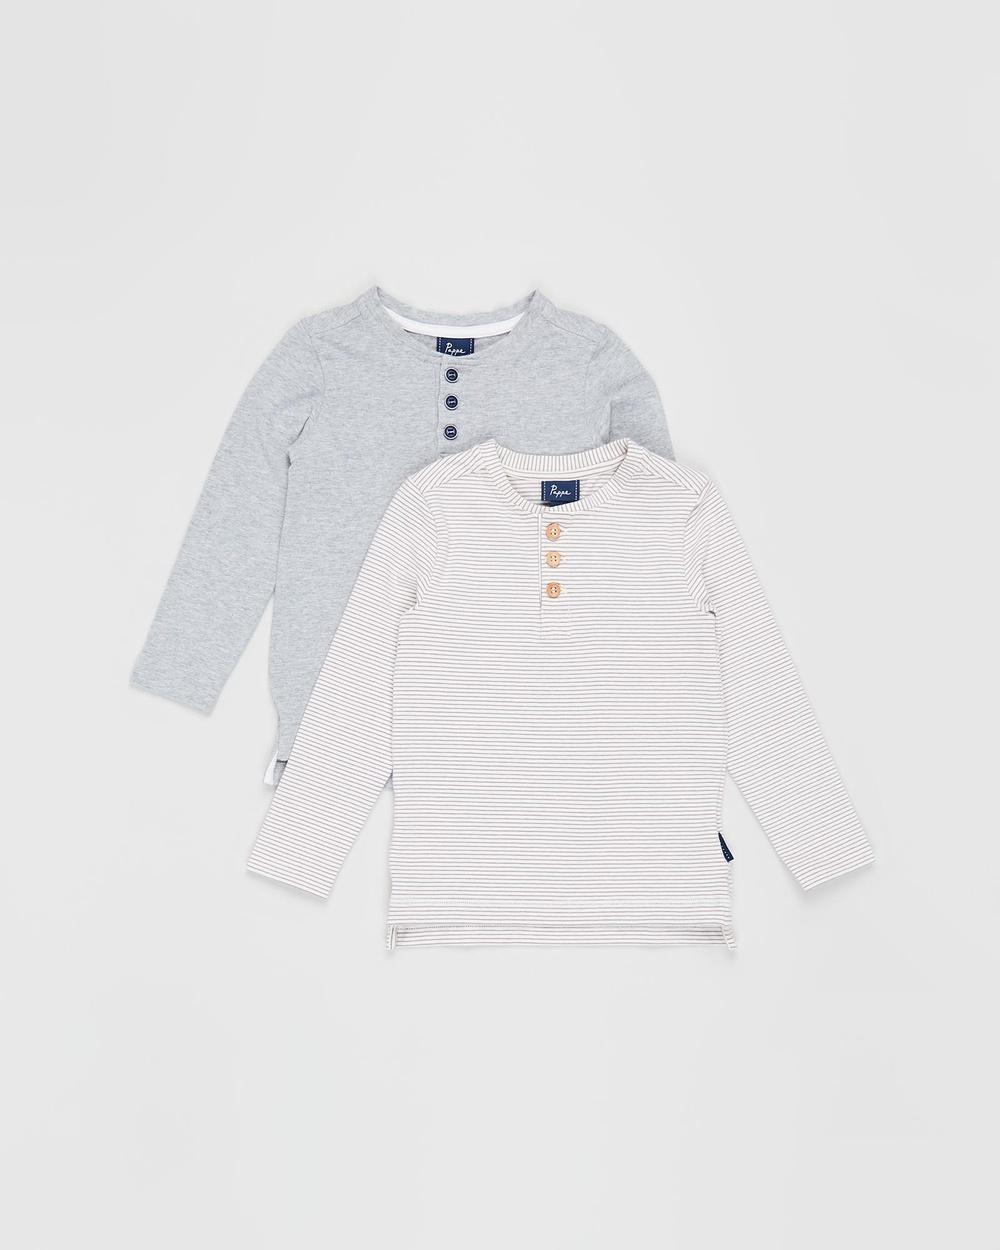 Pappe 2 Pack Croft Henley LS T Shirt Babies Kids T-Shirts & Singlets Grey Elderberry Stripe 2-Pack T-Shirt Babies-Kids Australia